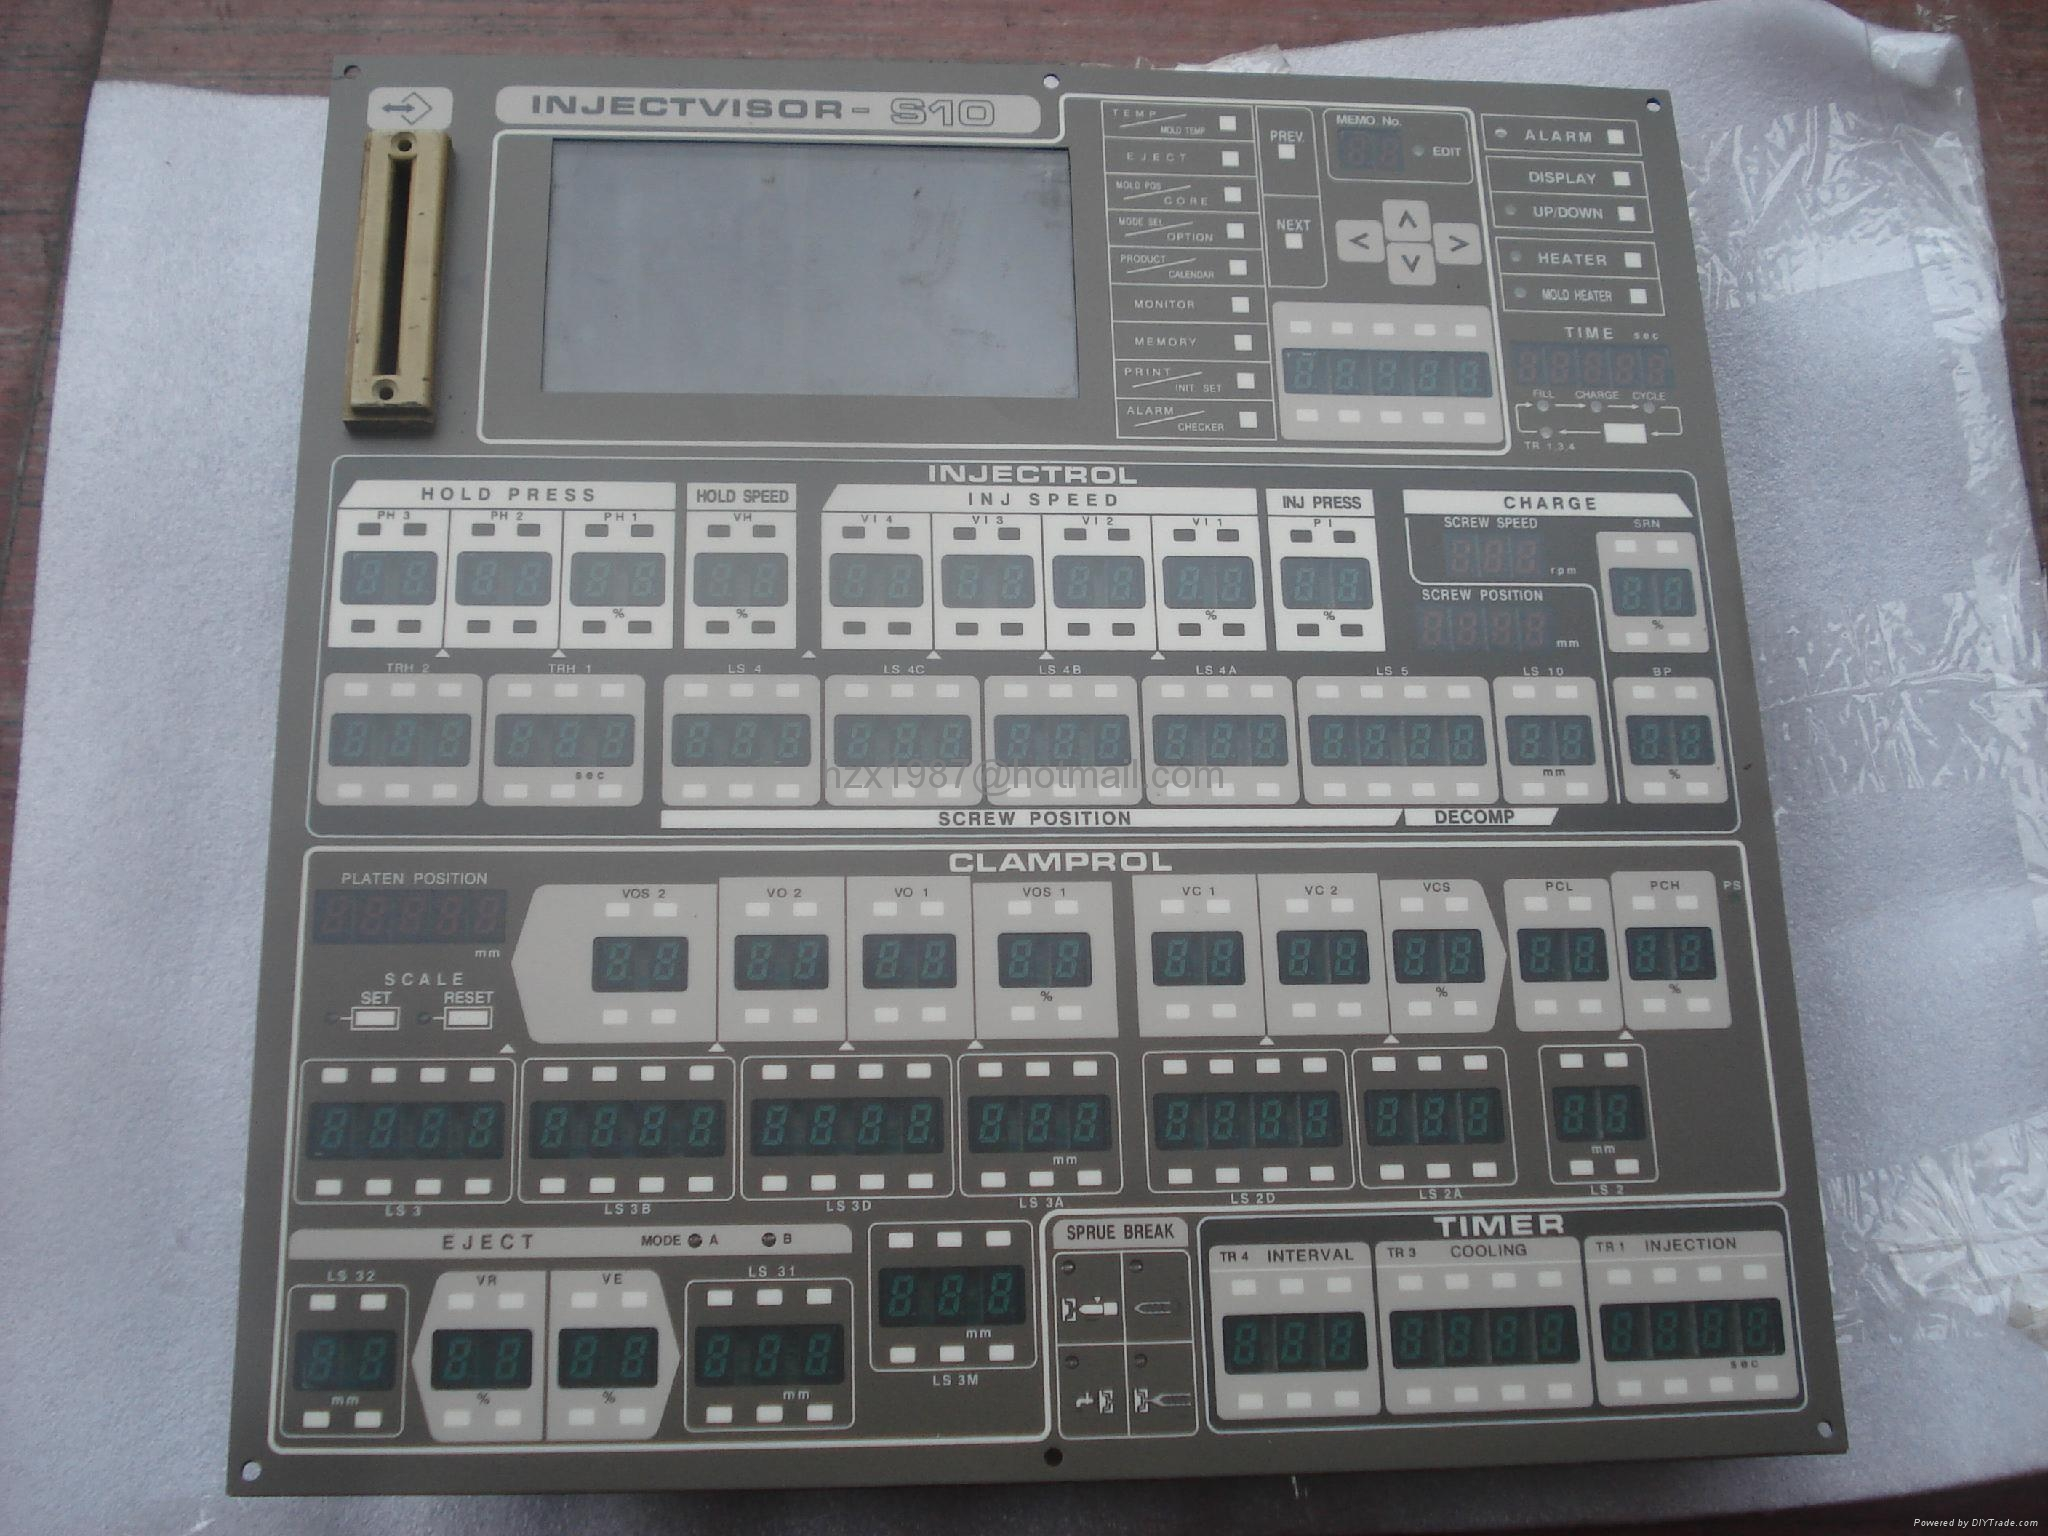 销售及维修显示器V30 ,V21 ,V710,东芝EC40NII-1Y EC40 NII-1Y机维修 11